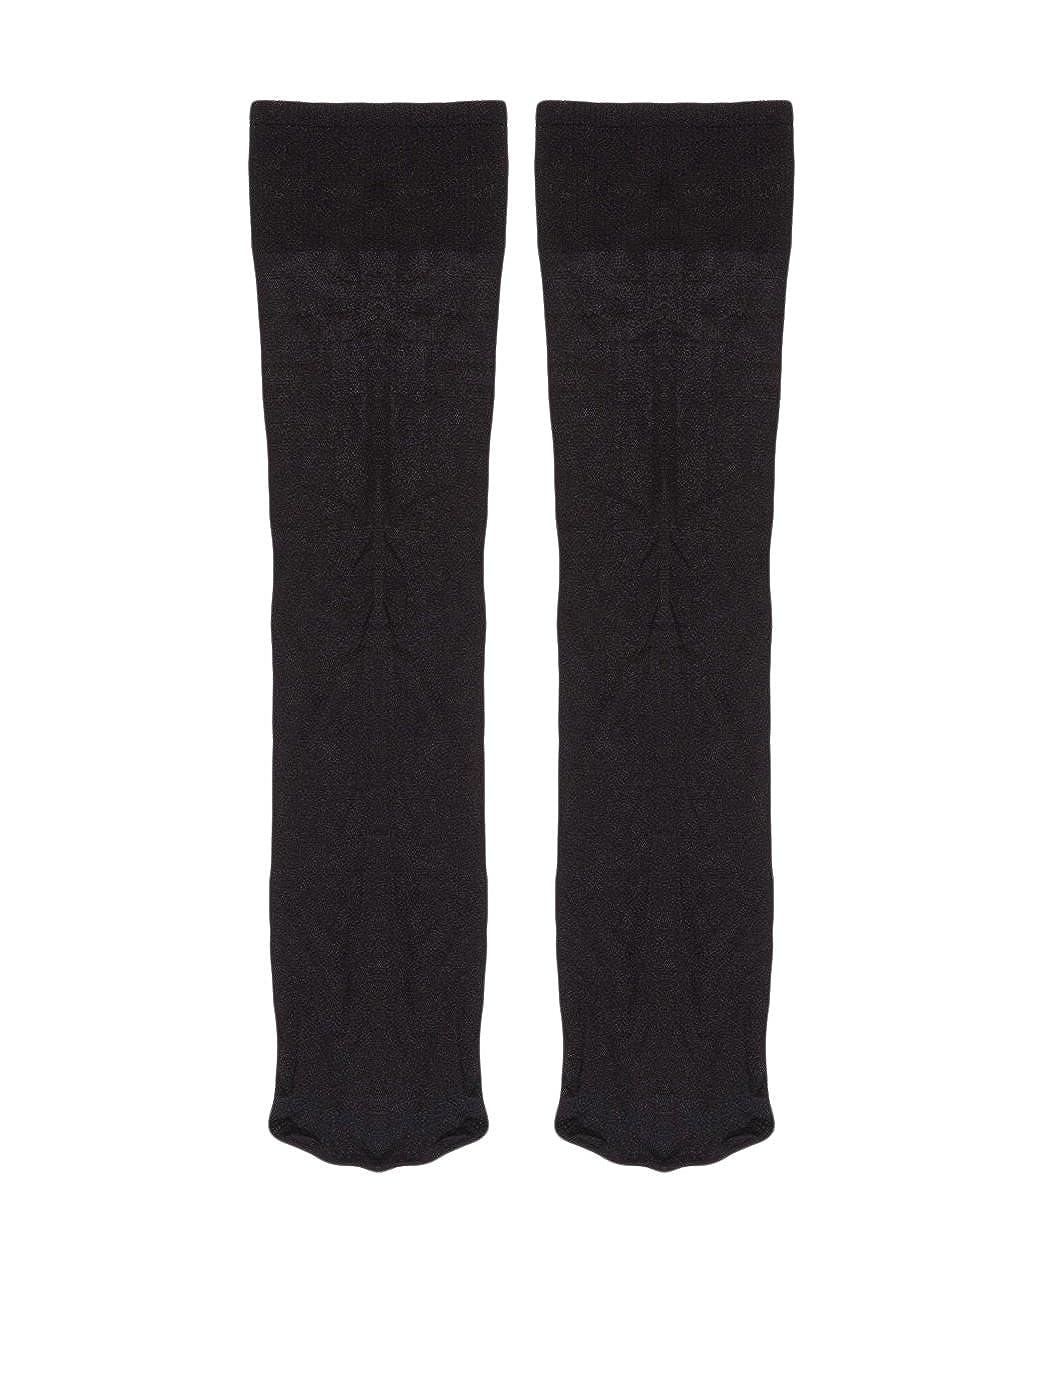 Marie Claire e Kler Pack x 6 Calcetines Negro EU 39-42: Amazon.es: Ropa y accesorios